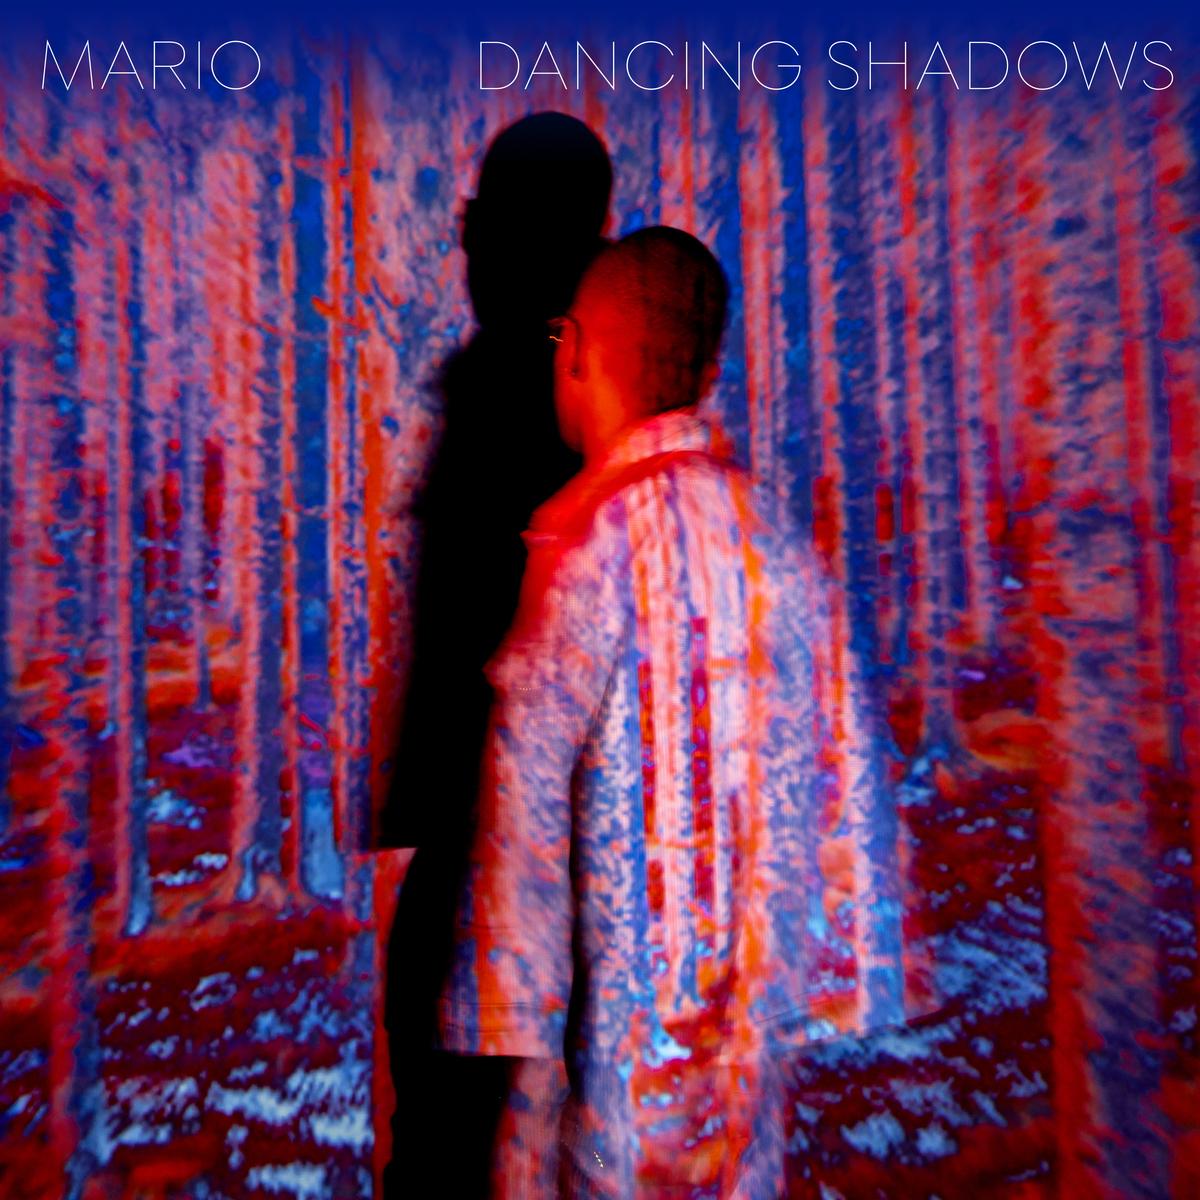 Articlehome dancing shadows  single 14.09.2018